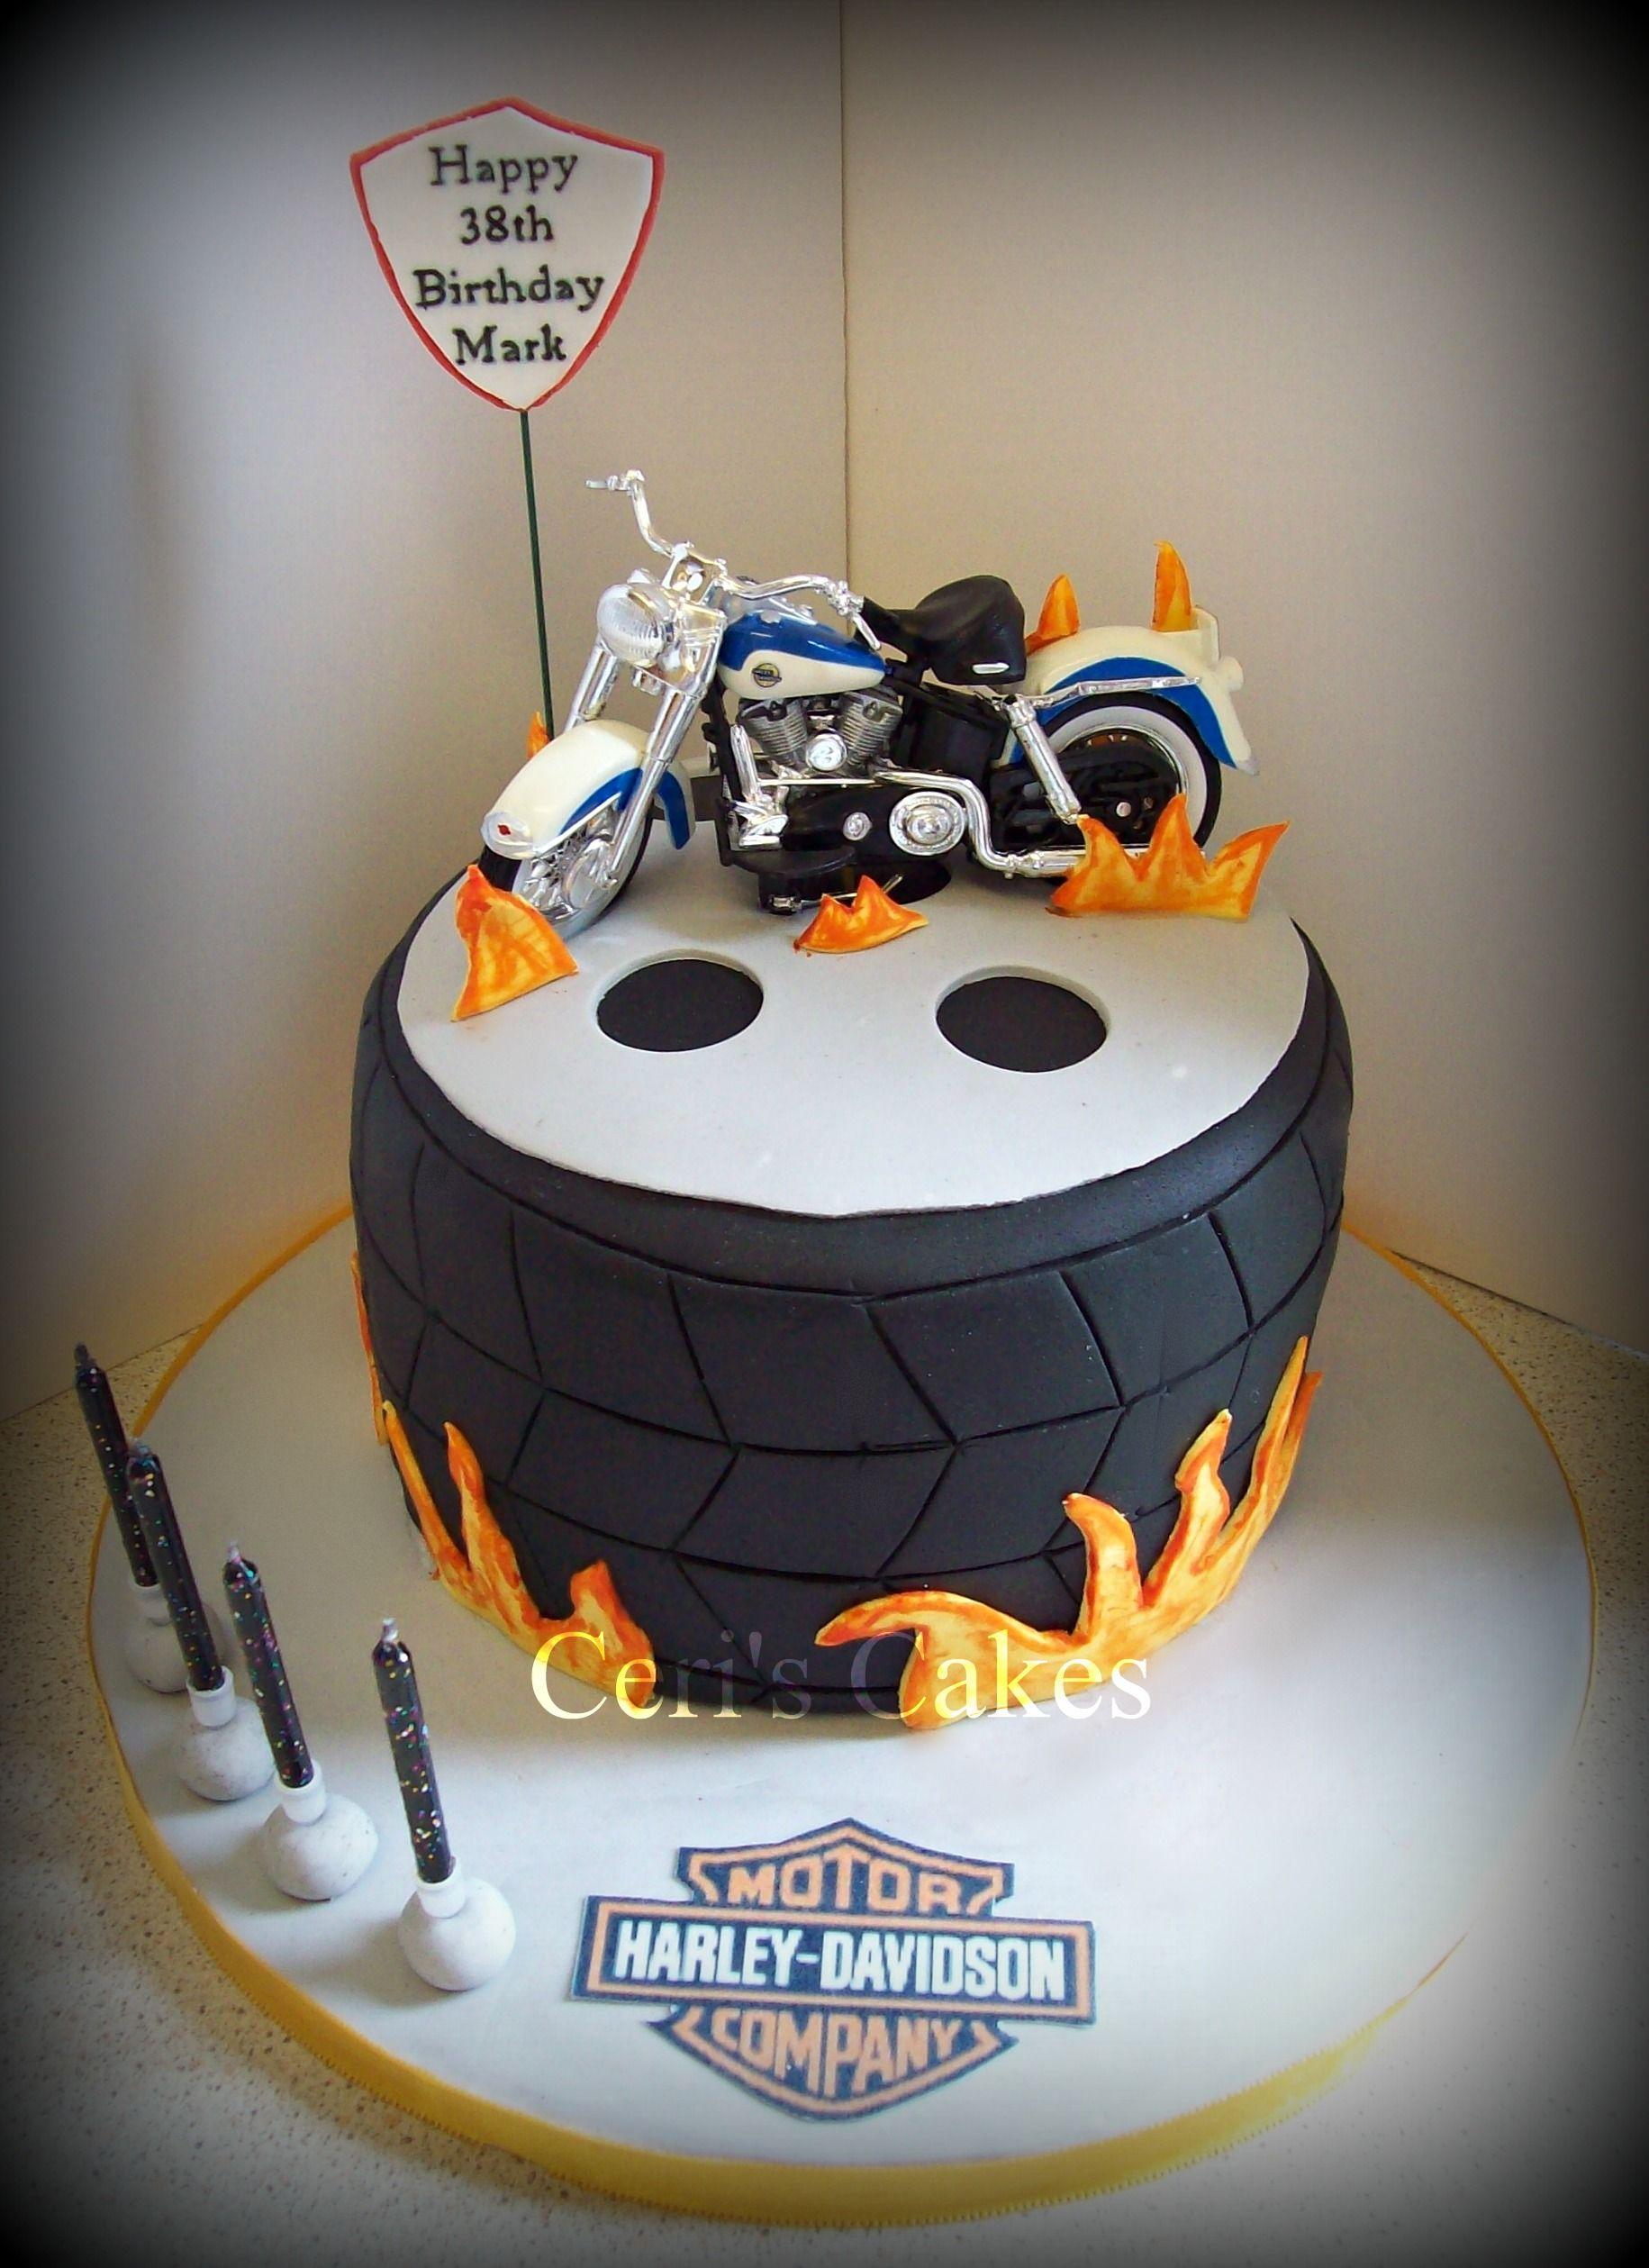 Harley Davidson Cake Decorations Harley Davidson Cake Ceris Cakes Bills Cake Pinterest Bill